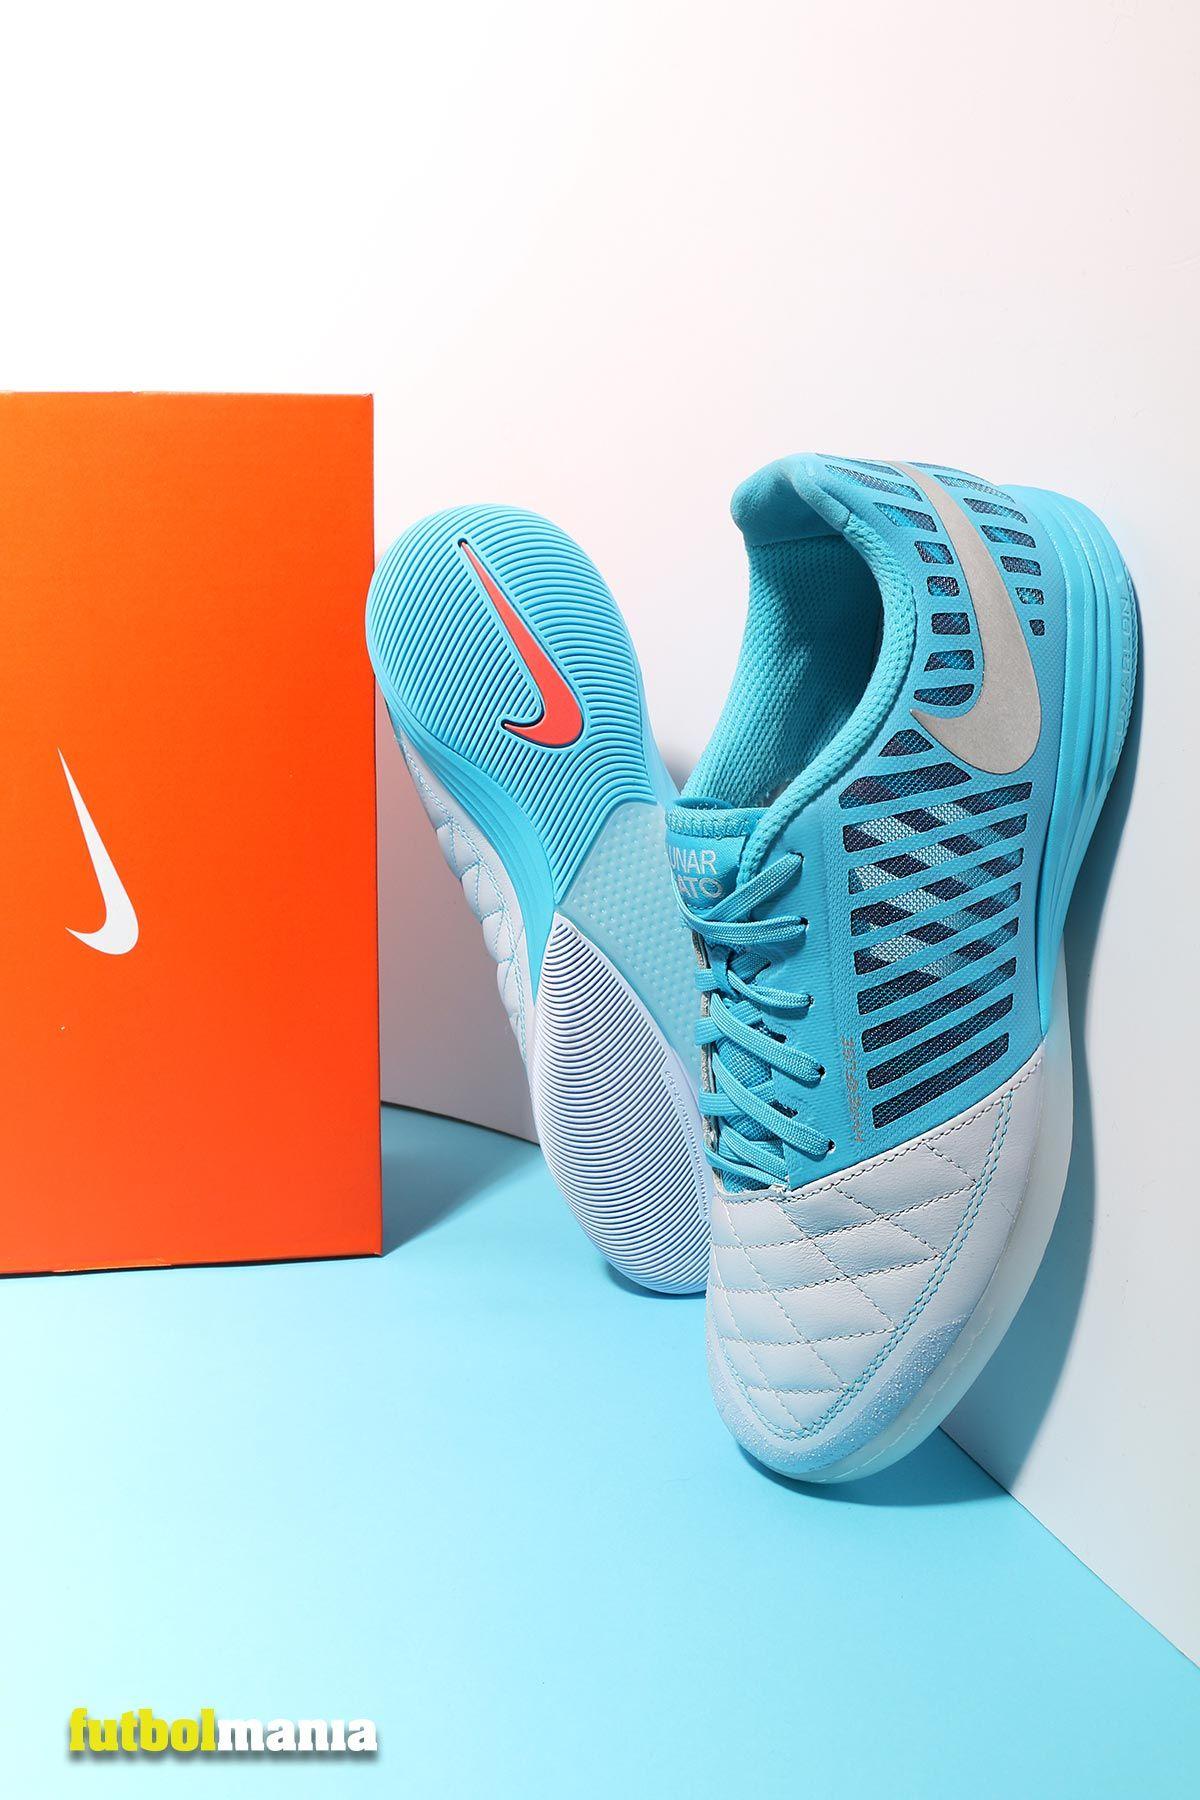 Nike Lunar Gato II | Zapatillas de futbol sala, Zapatos de